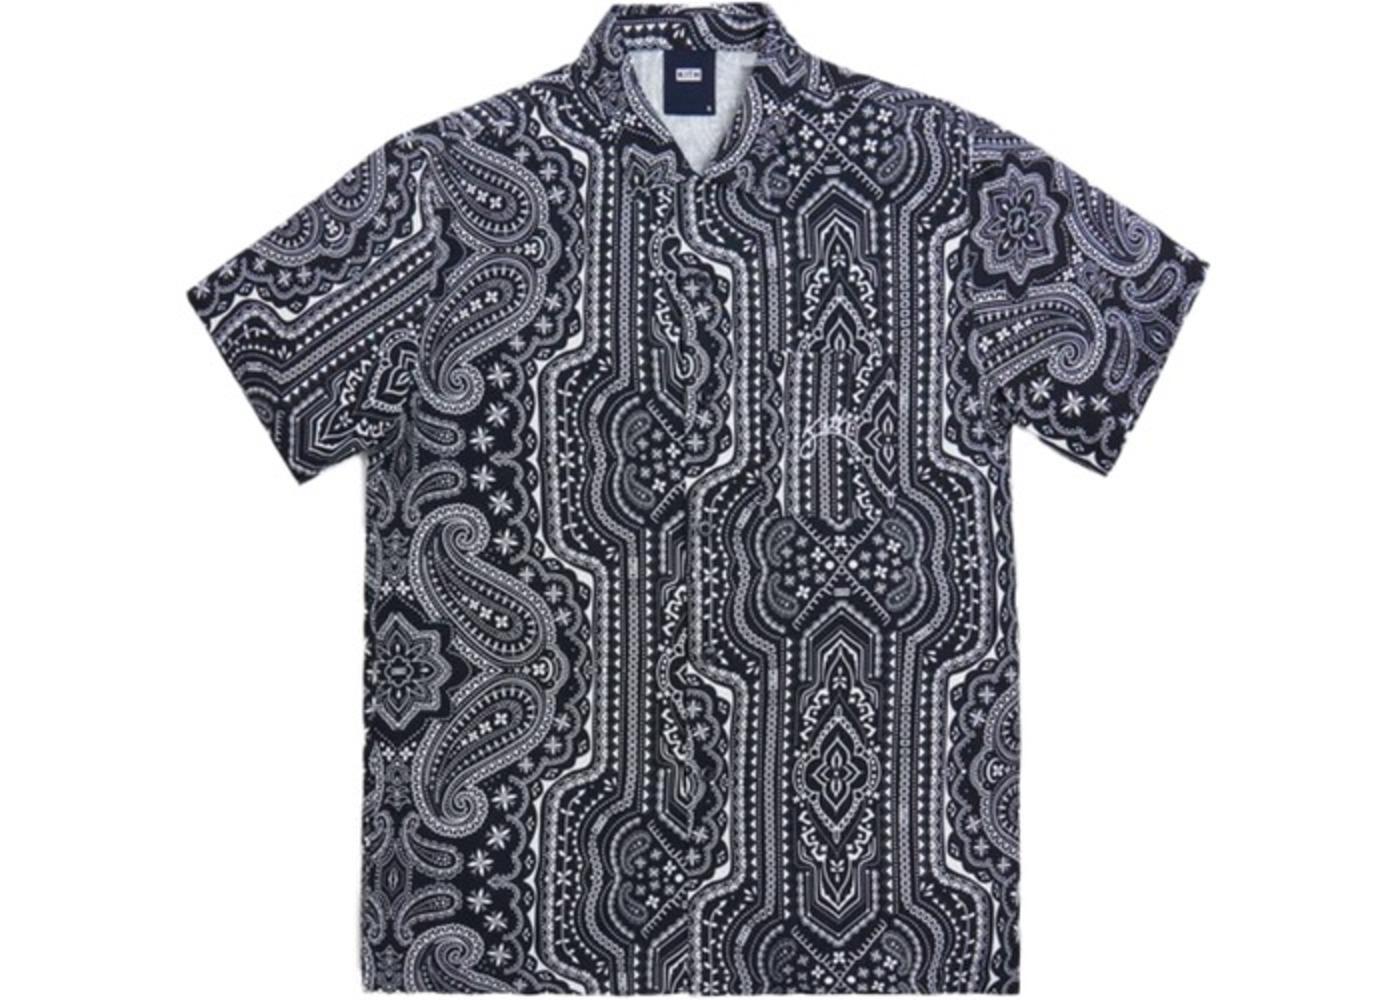 Kith Camp Collar Silk Cotton Shirt Black/Multi の写真